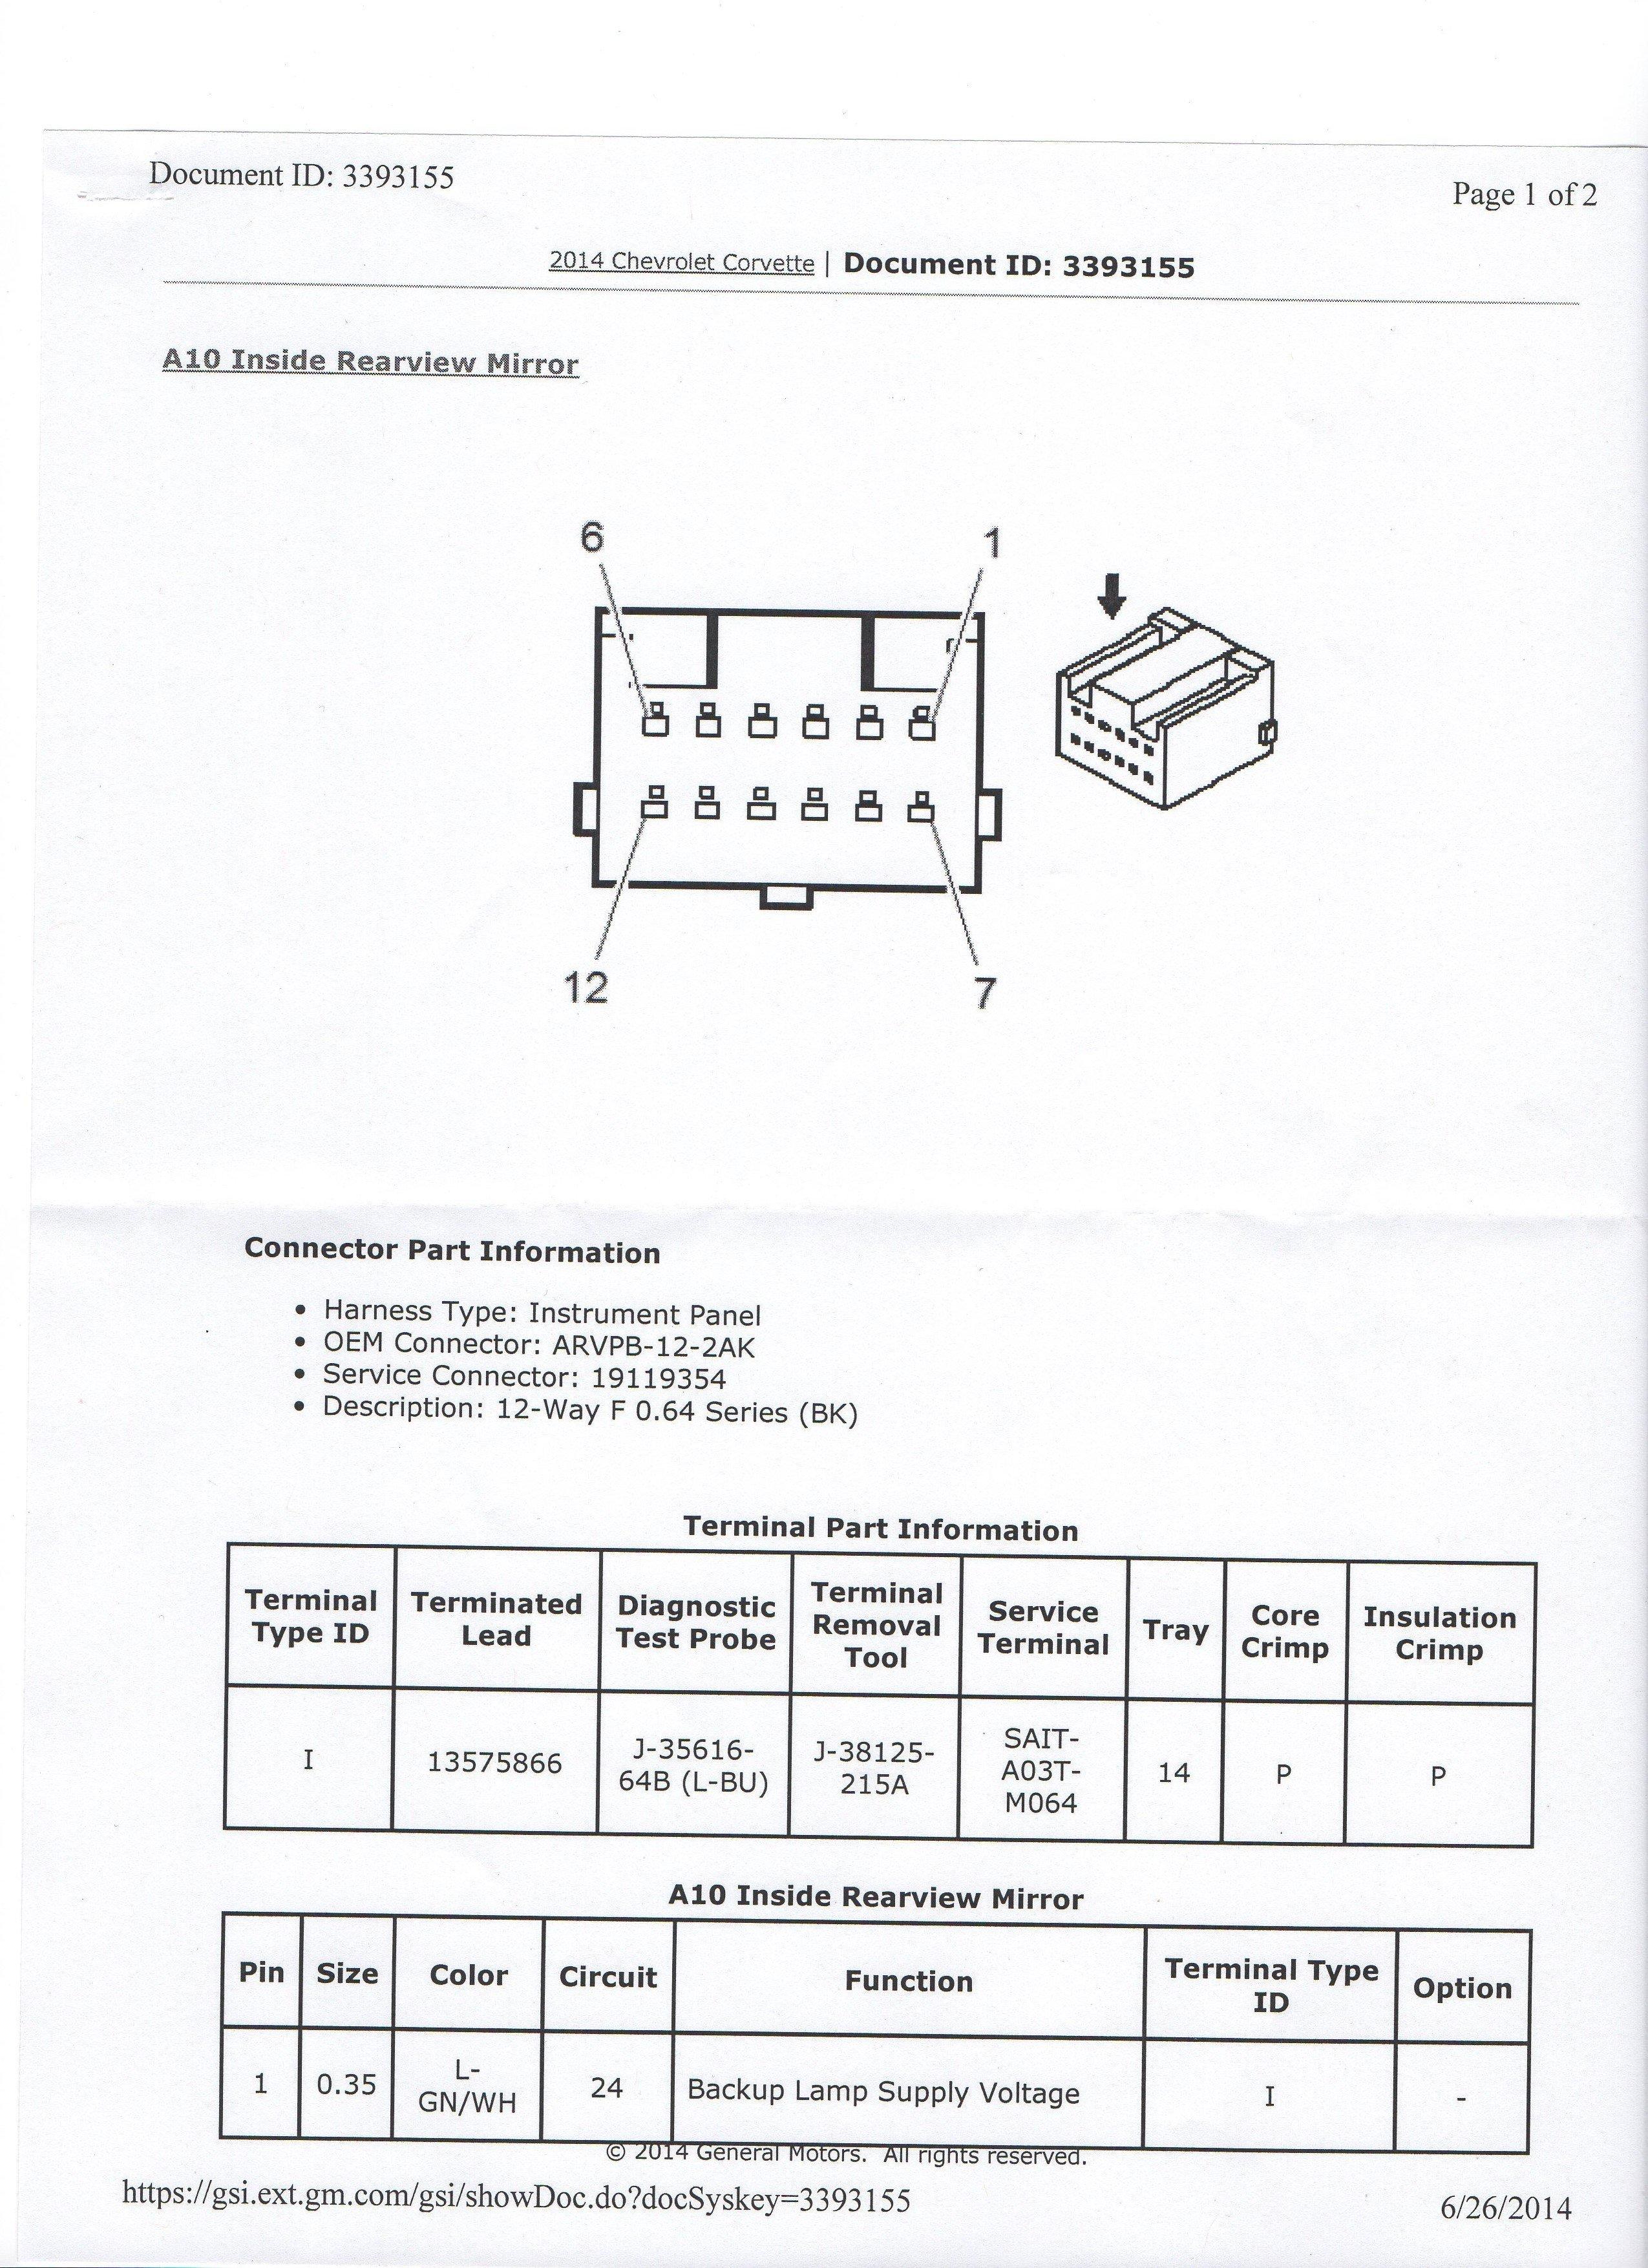 mk_2056] deh wiring diagram wiring diagram onstar wiring diagram ... onstar wiring diagram free picture schematic 1994 chevy truck wiring diagram free jidig feren bachi oxyt heeve mohammedshrine librar wiring 101